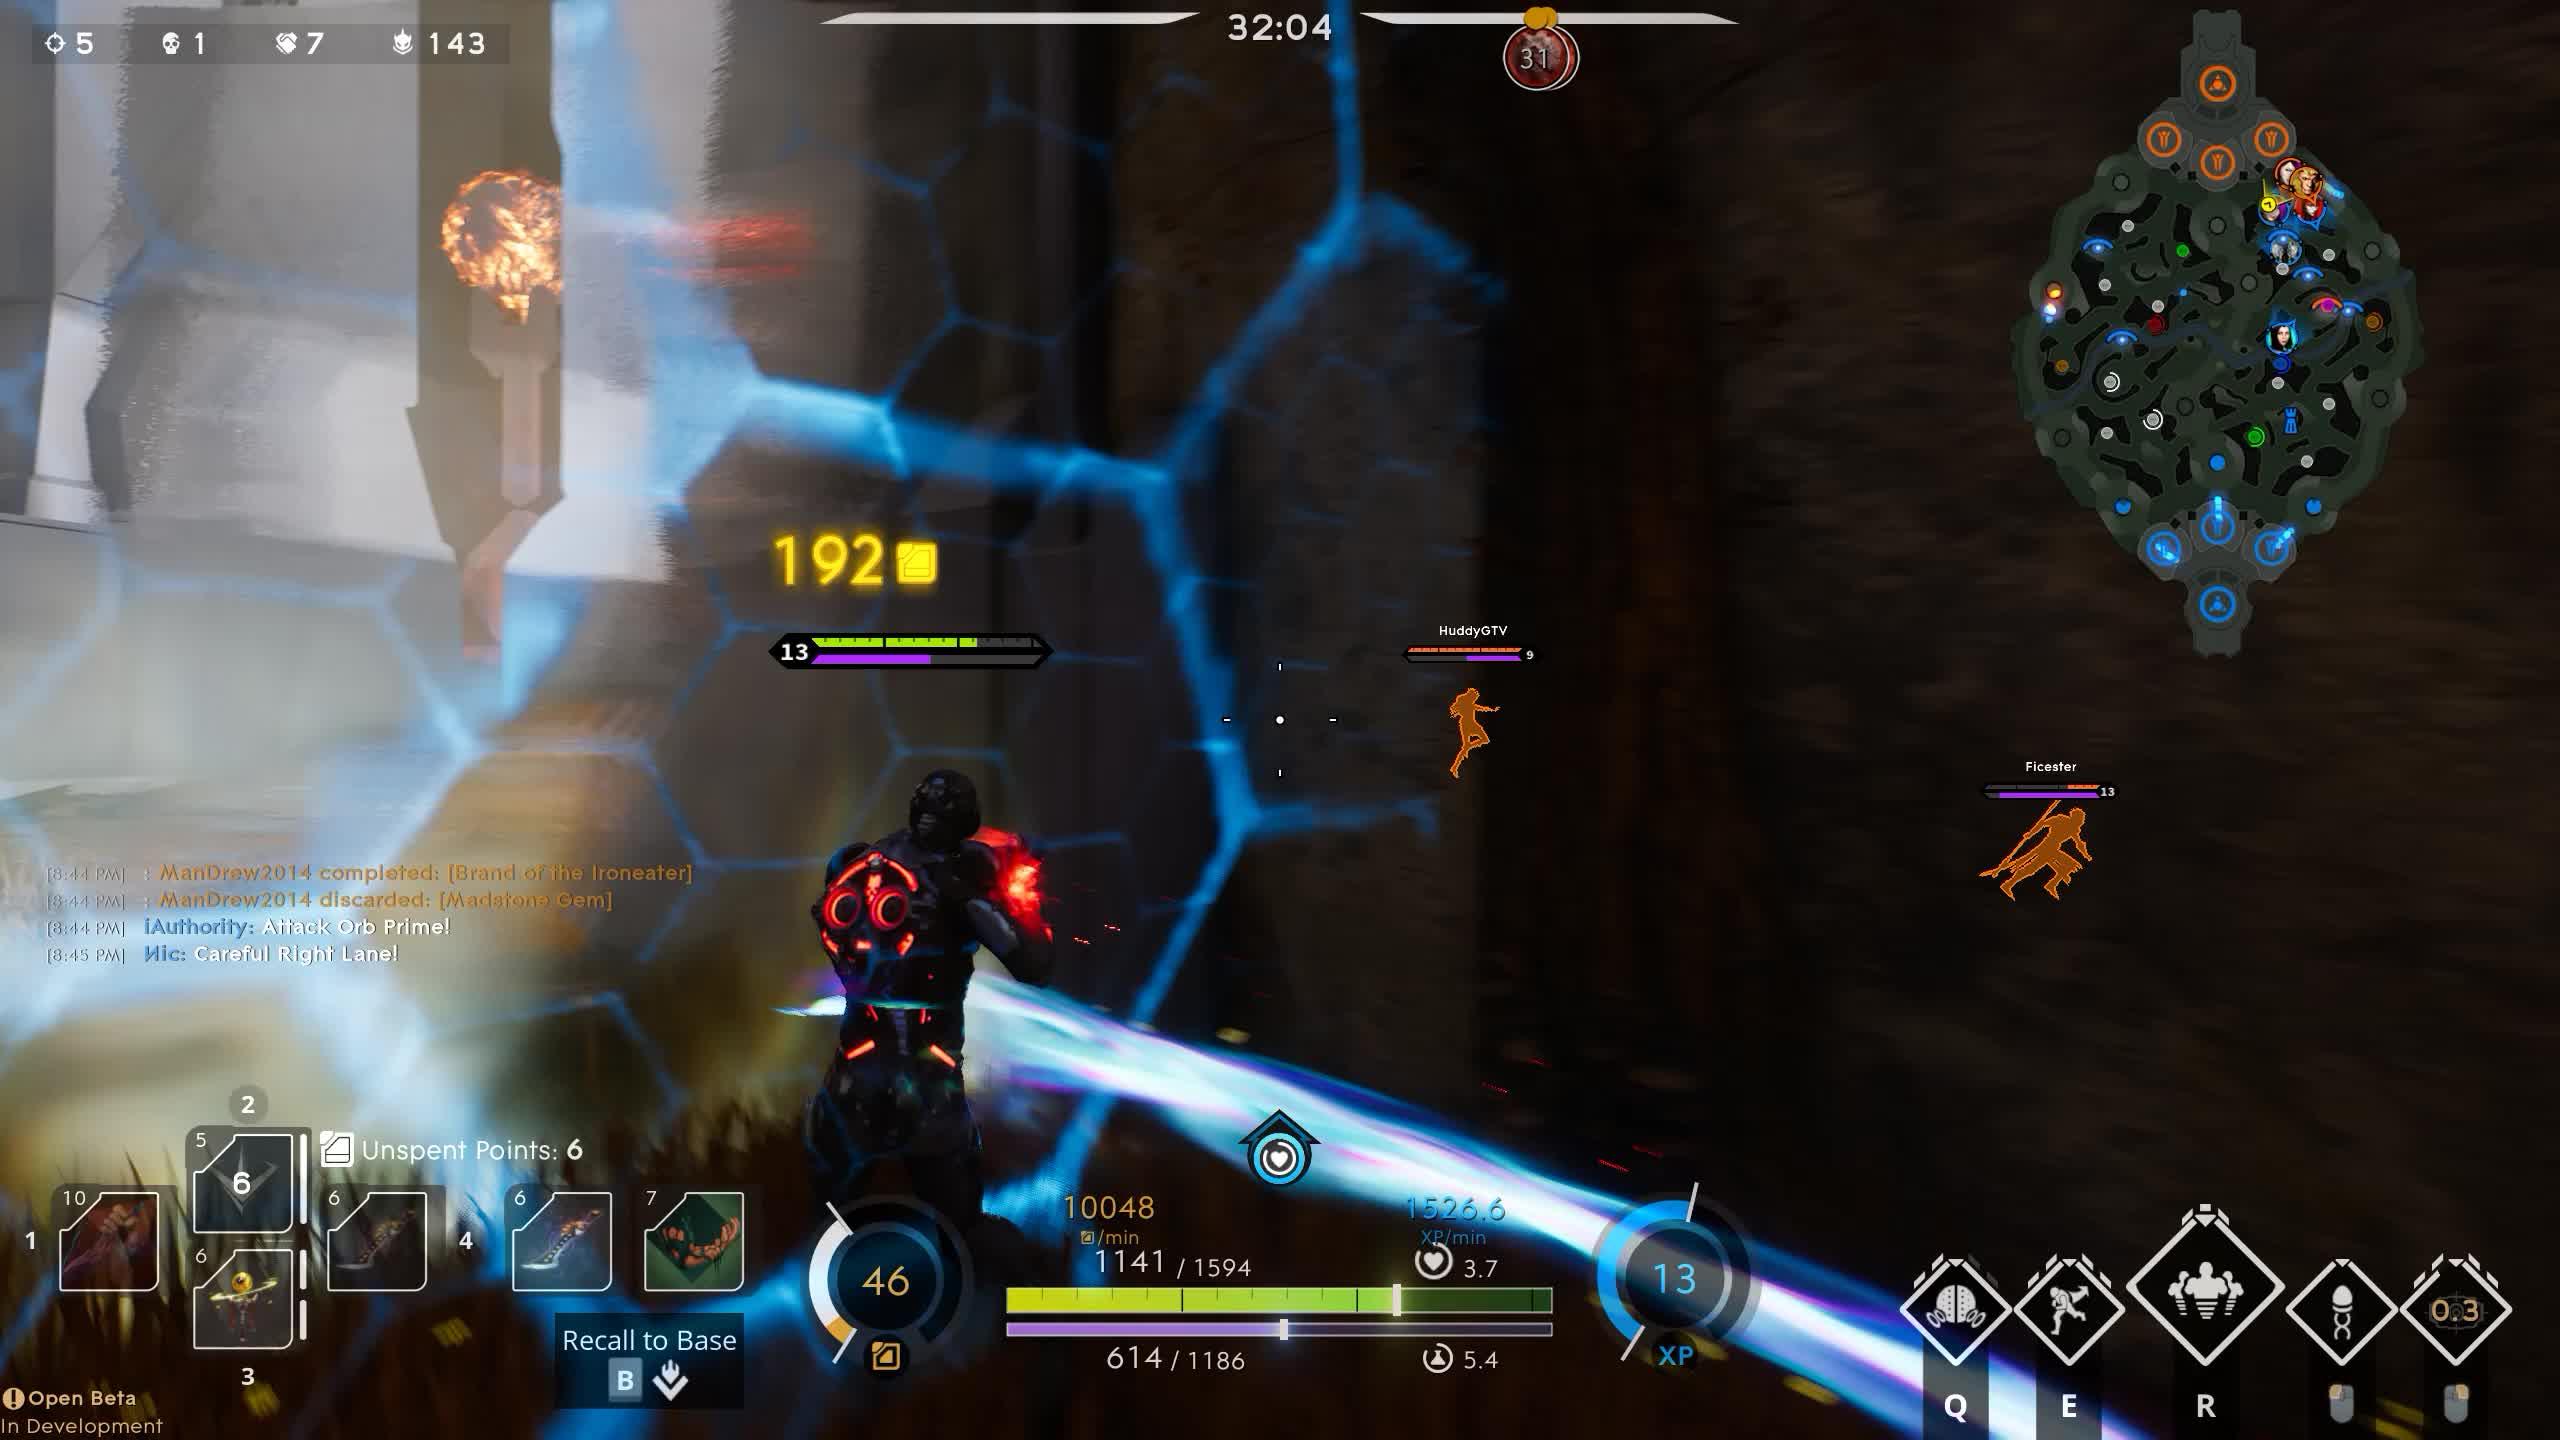 Monolith, Paragon, Wraith, Wraith Air Snipe Saves Countess GIFs